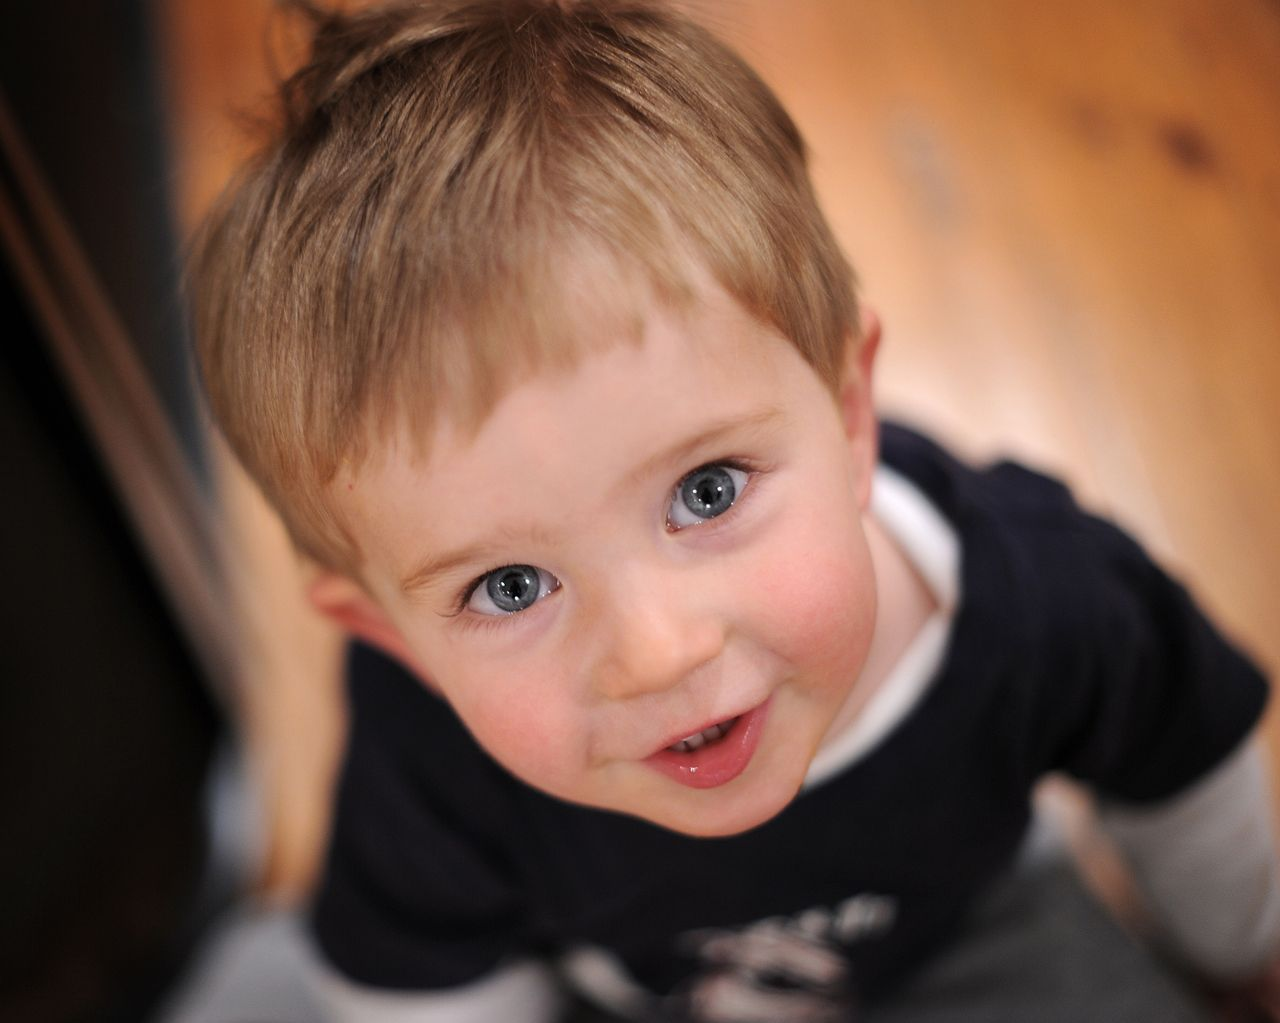 Wallpaper Of Cute Babies Boys Desktop Wallpapers Top Wallpaper Cute Baby Boy Images Cute Baby Boy Cute Baby Boy Pictures